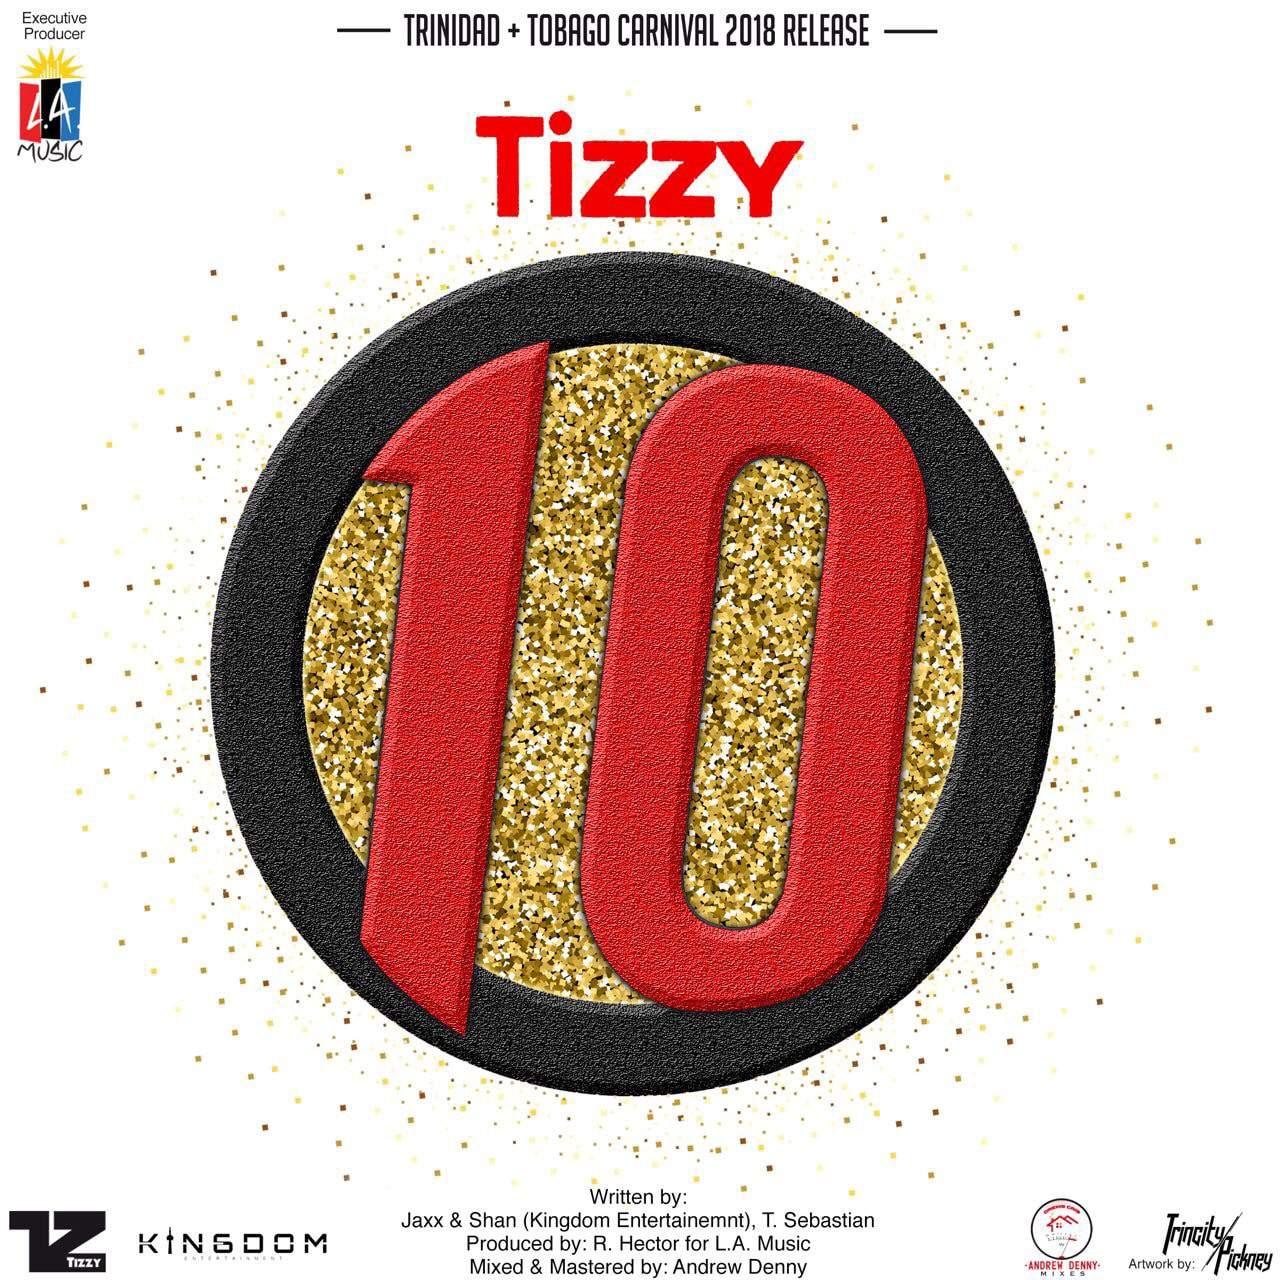 Tizzy - 10 - L.A. Music - Trinidad & Tobago Carnival 2018 Release